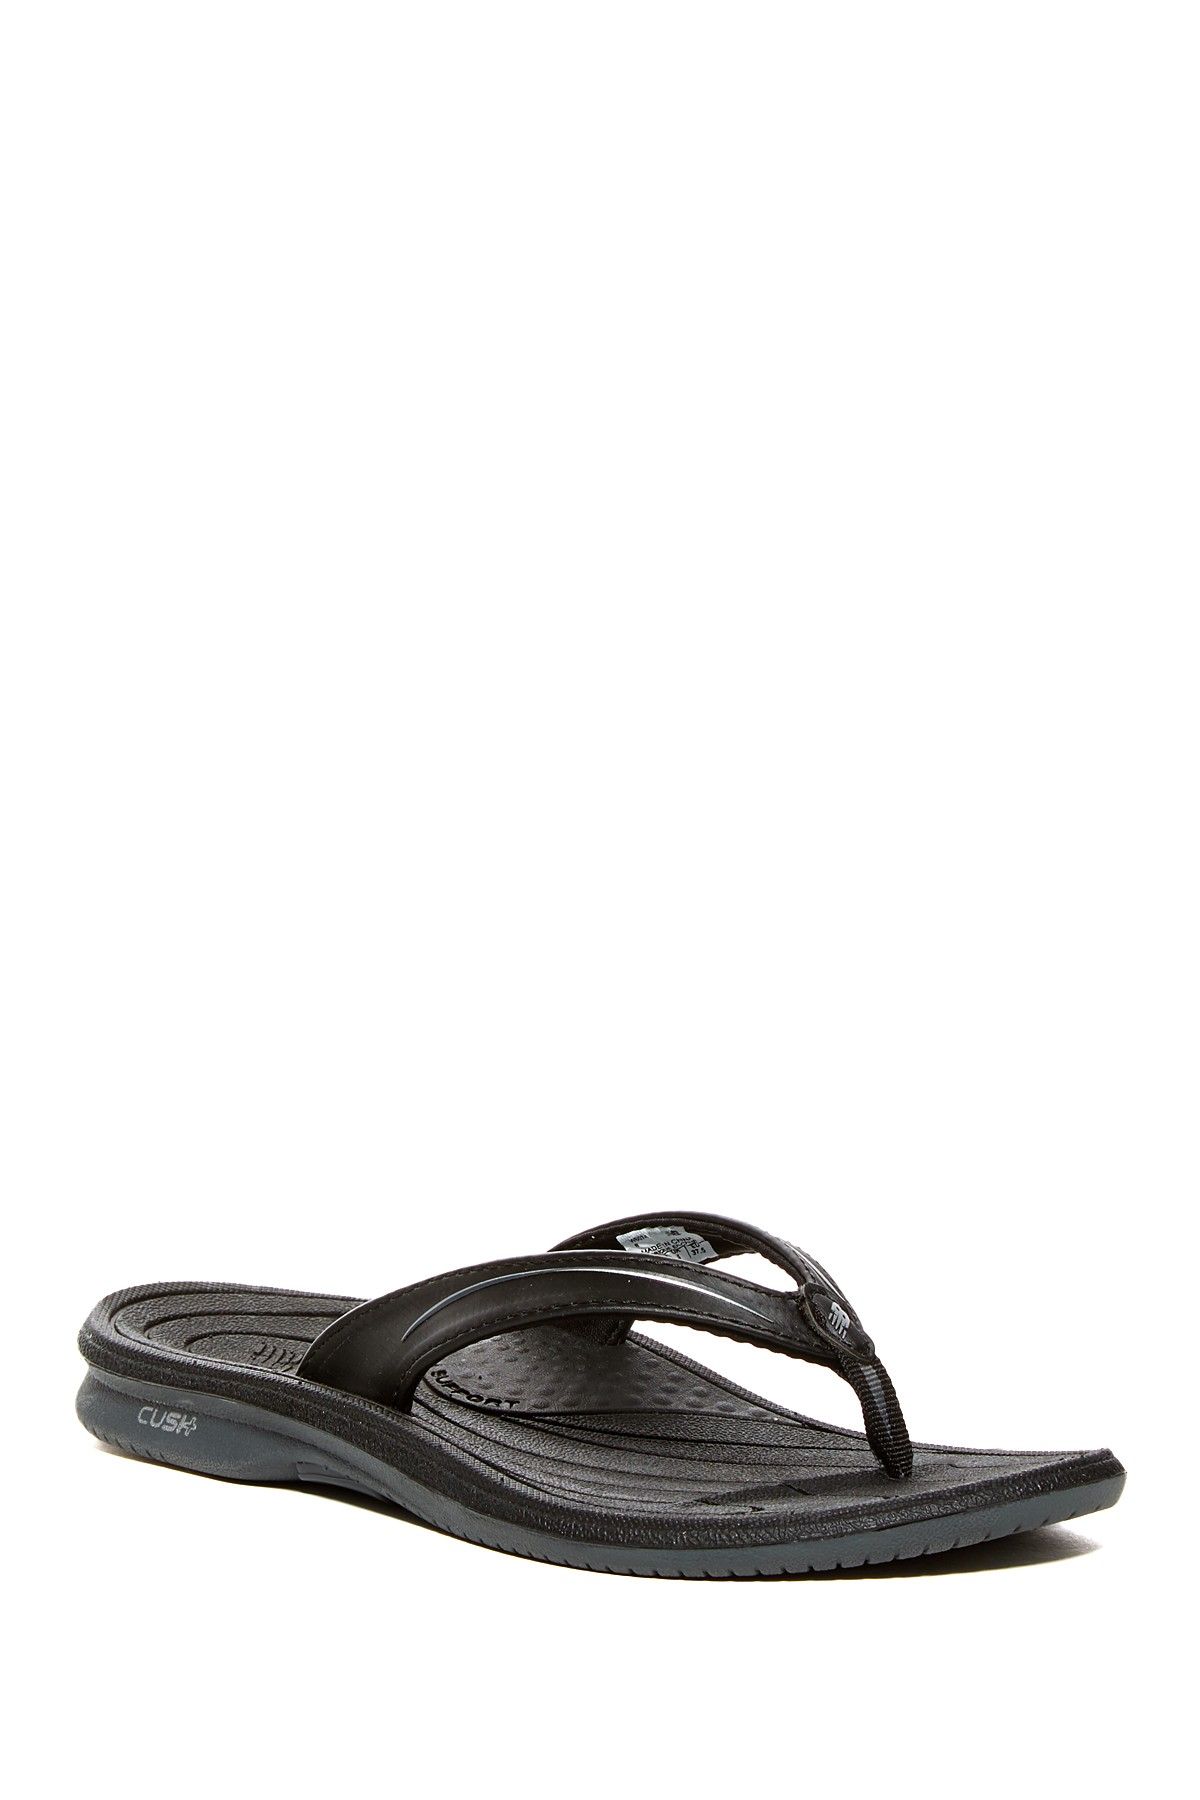 New Balance Cush Plus Thong Sandal In Black Lyst